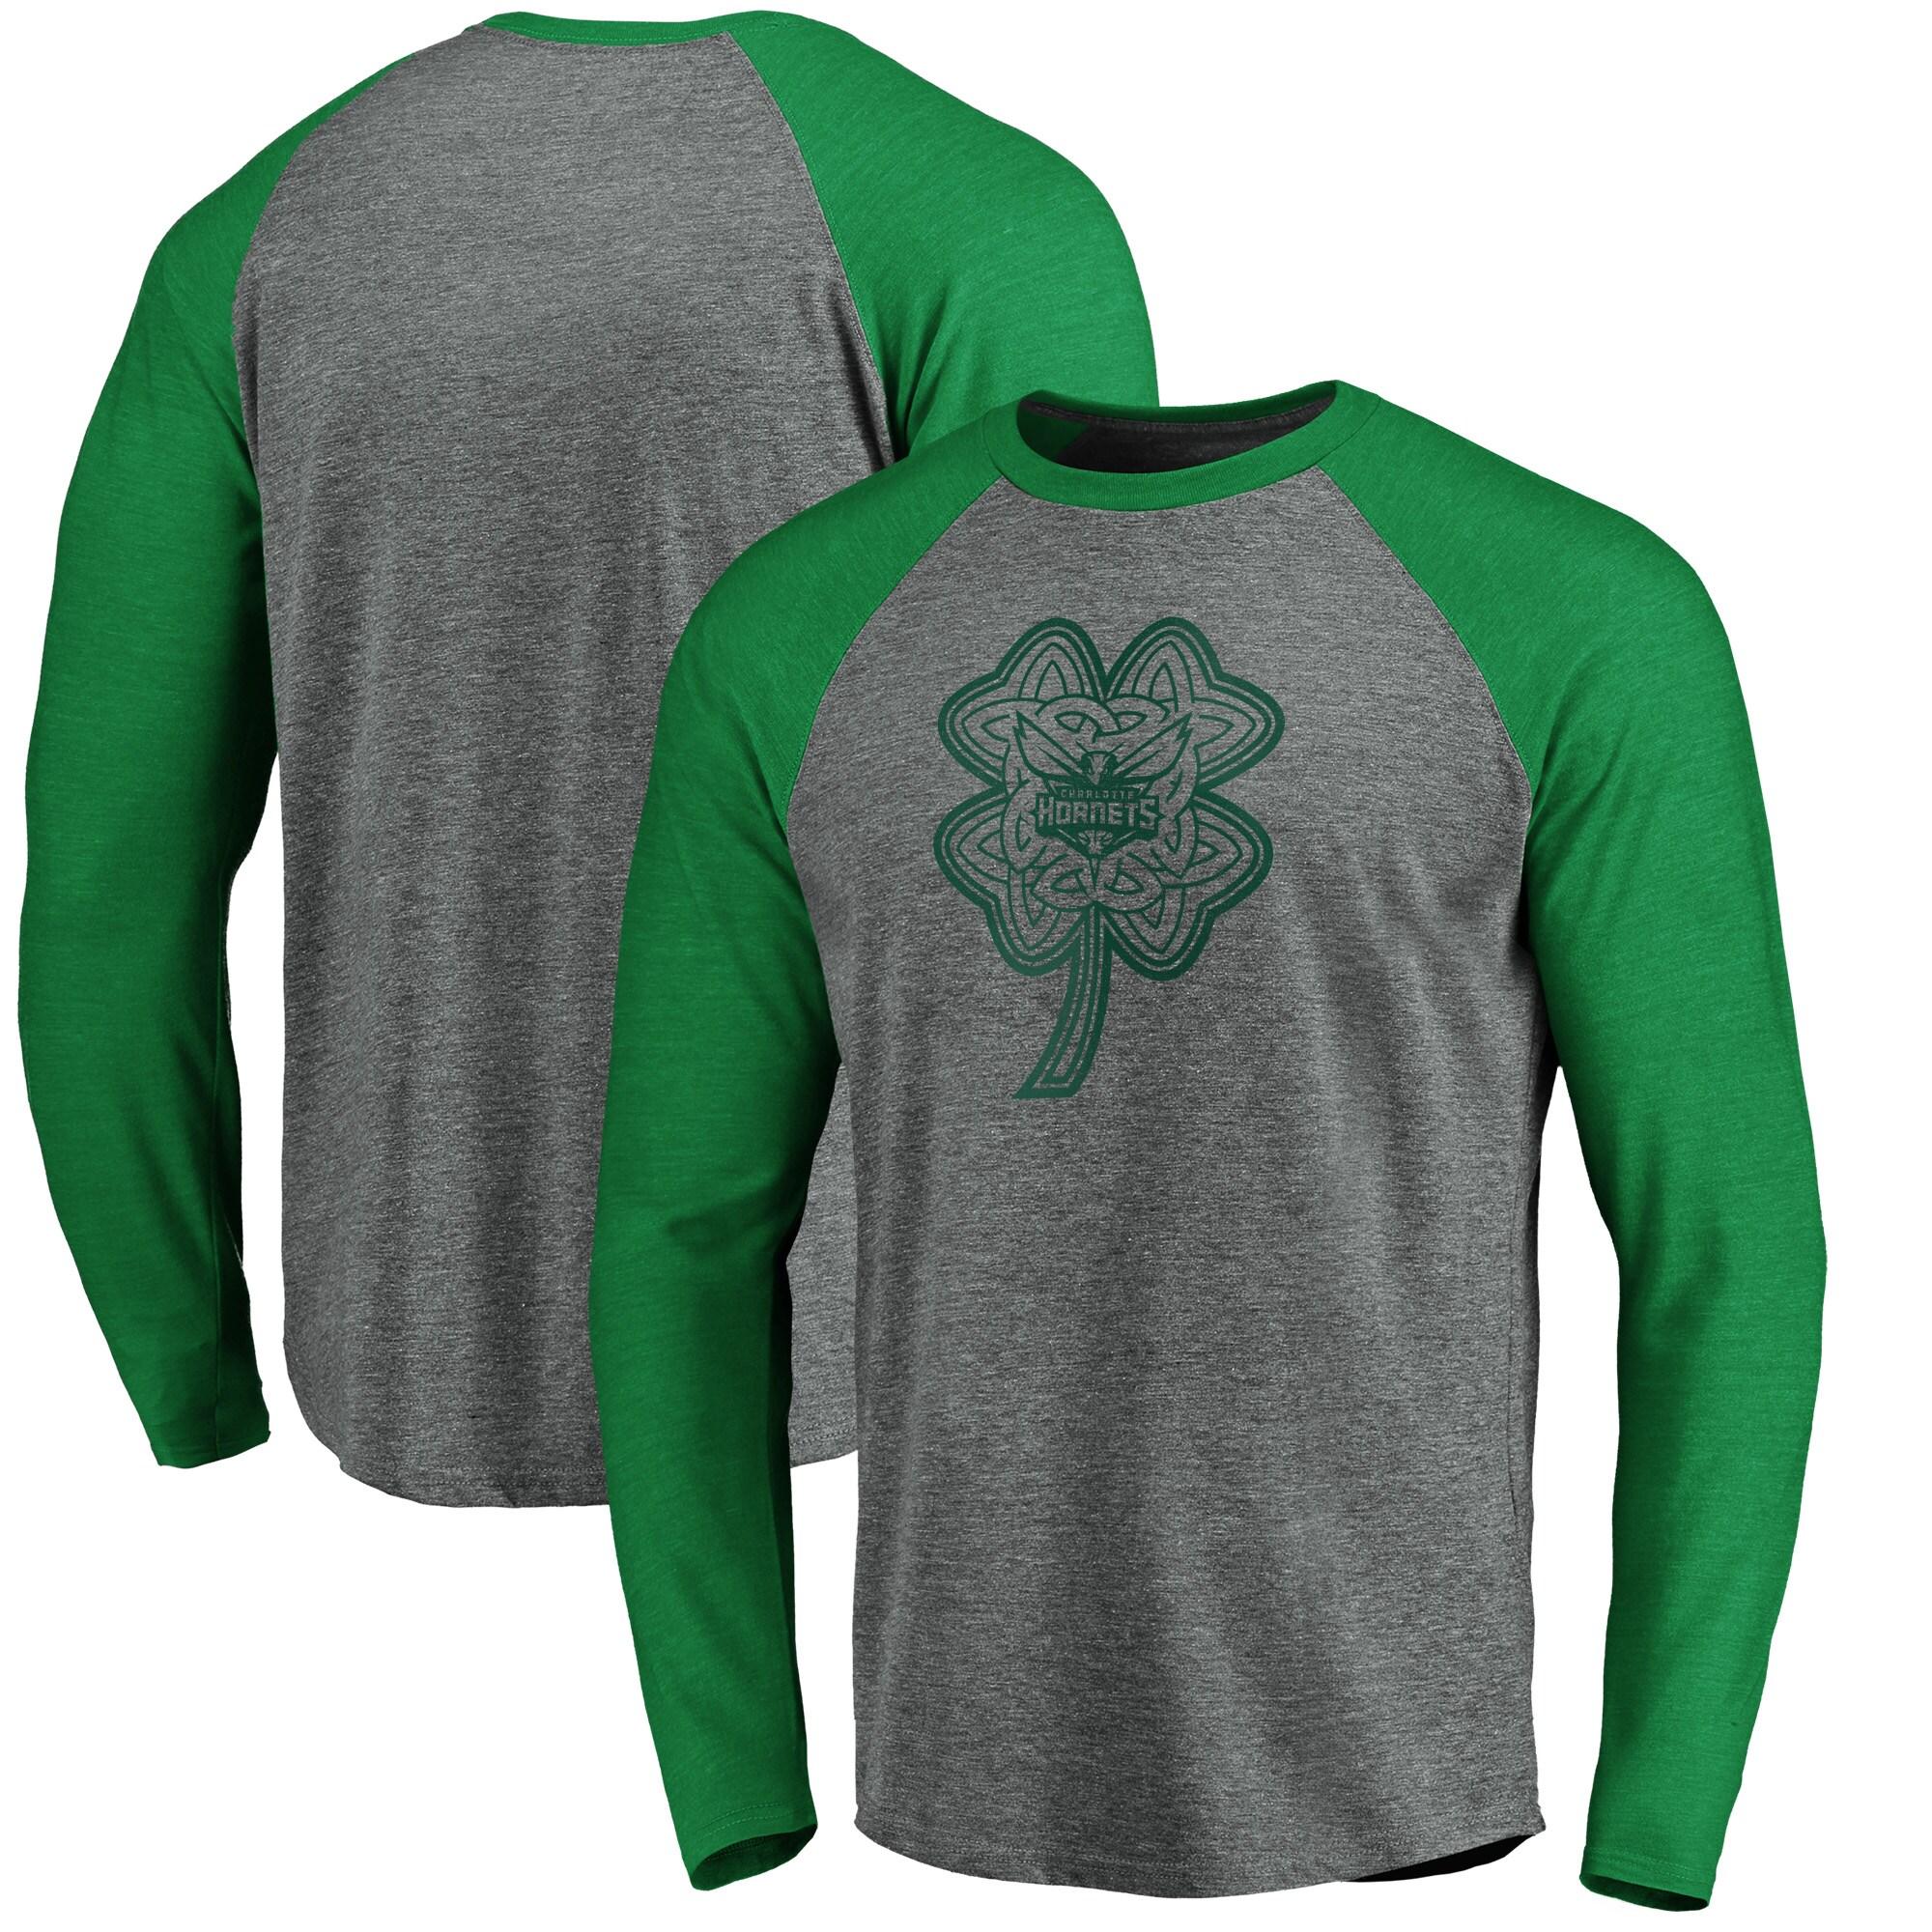 Charlotte Hornets Fanatics Branded St. Patrick's Day Celtic Charm Raglan Tri-Blend Long Sleeve T-Shirt - Heathered Gray